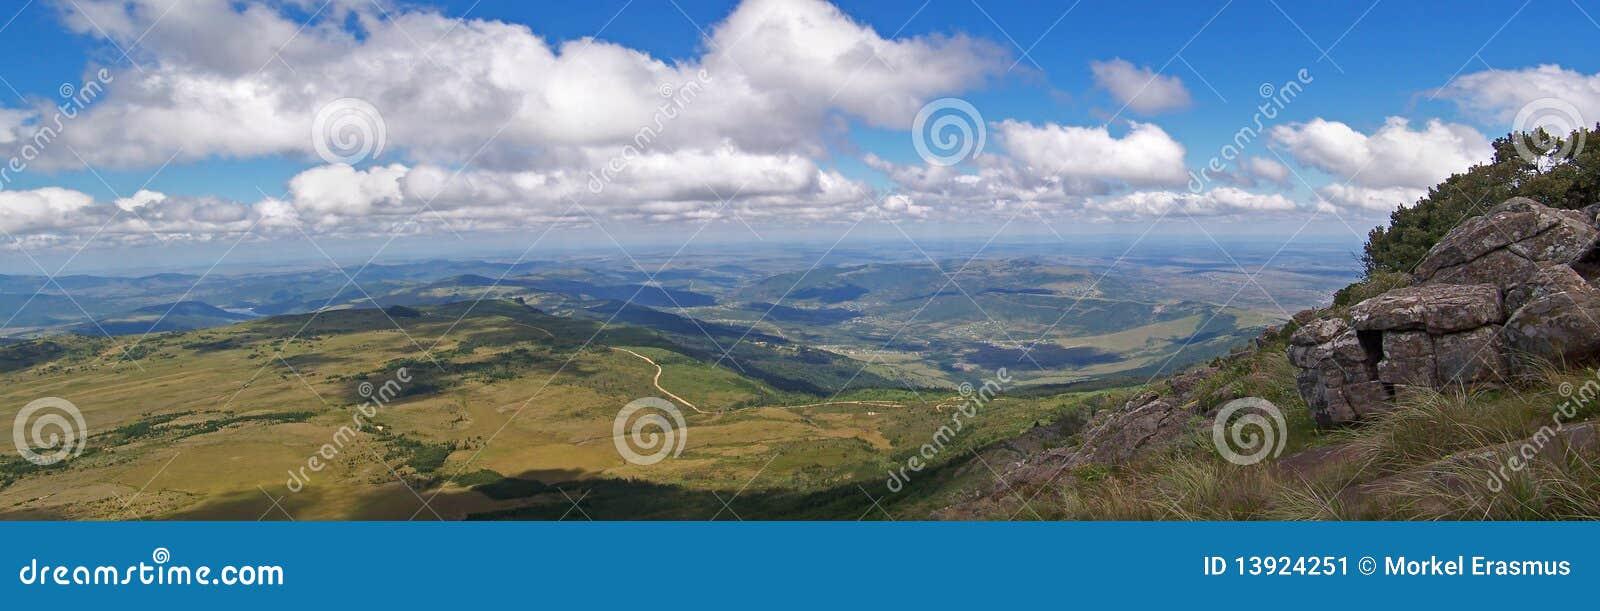 Amatola panorâmico Vista